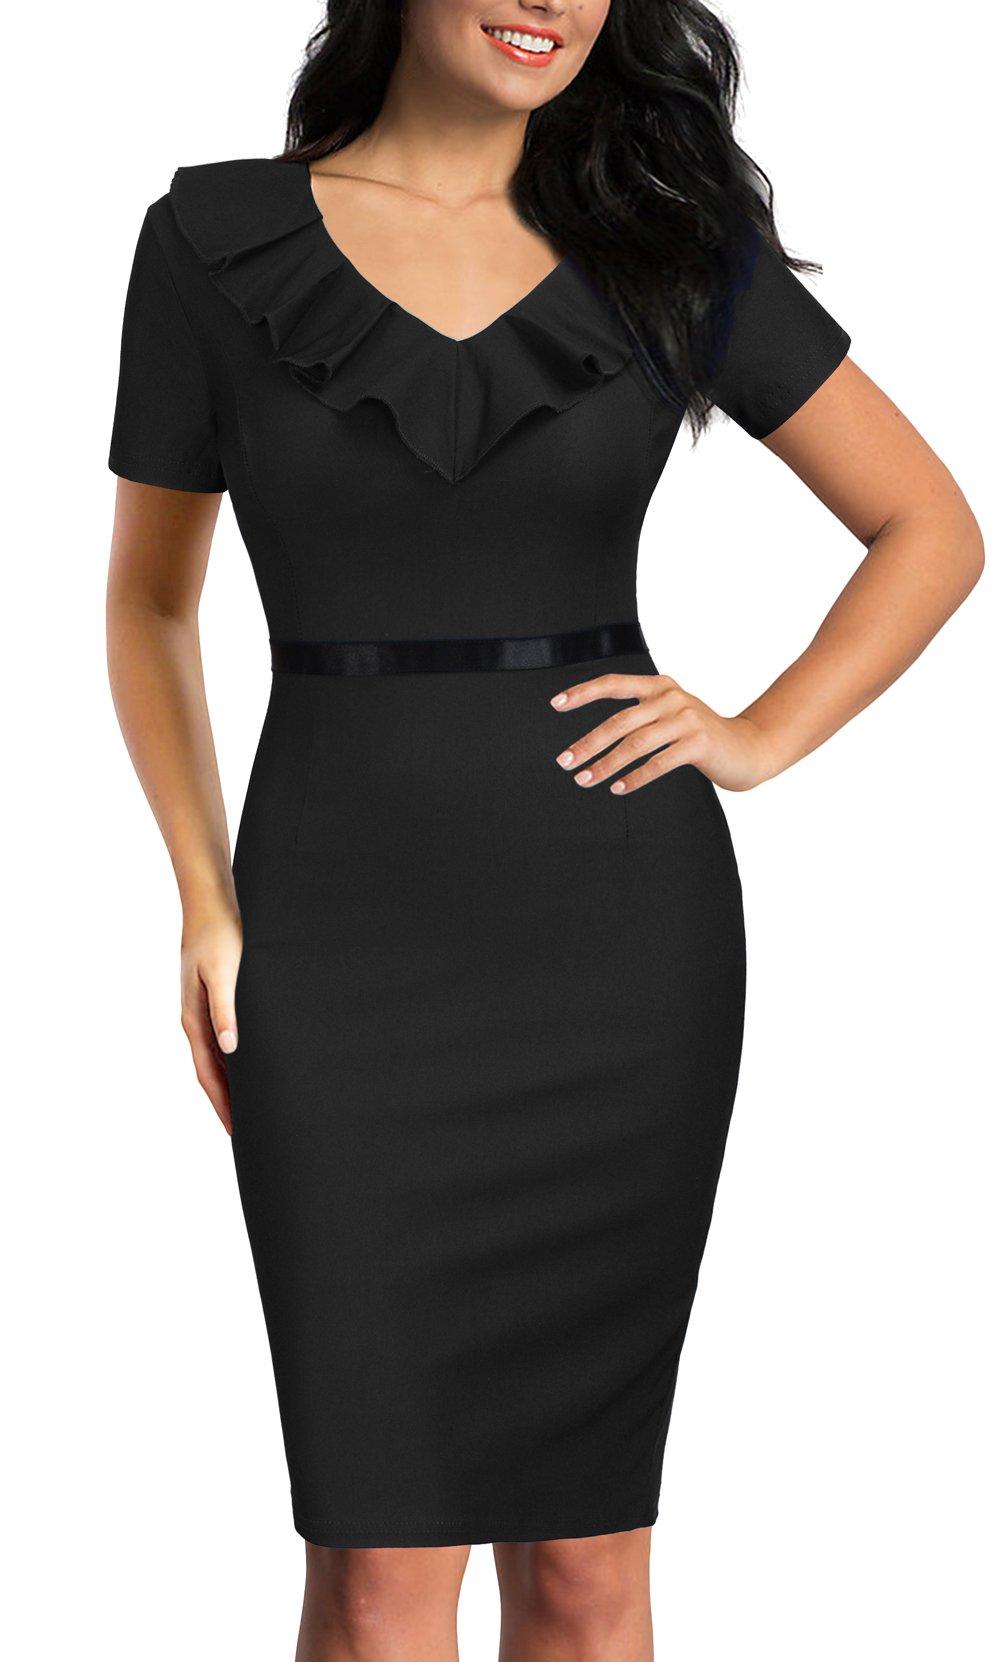 REPHYLLIS Women's Ruffles Short Sleeve Business Cocktail Pencil Dress XL Black by REPHYLLIS